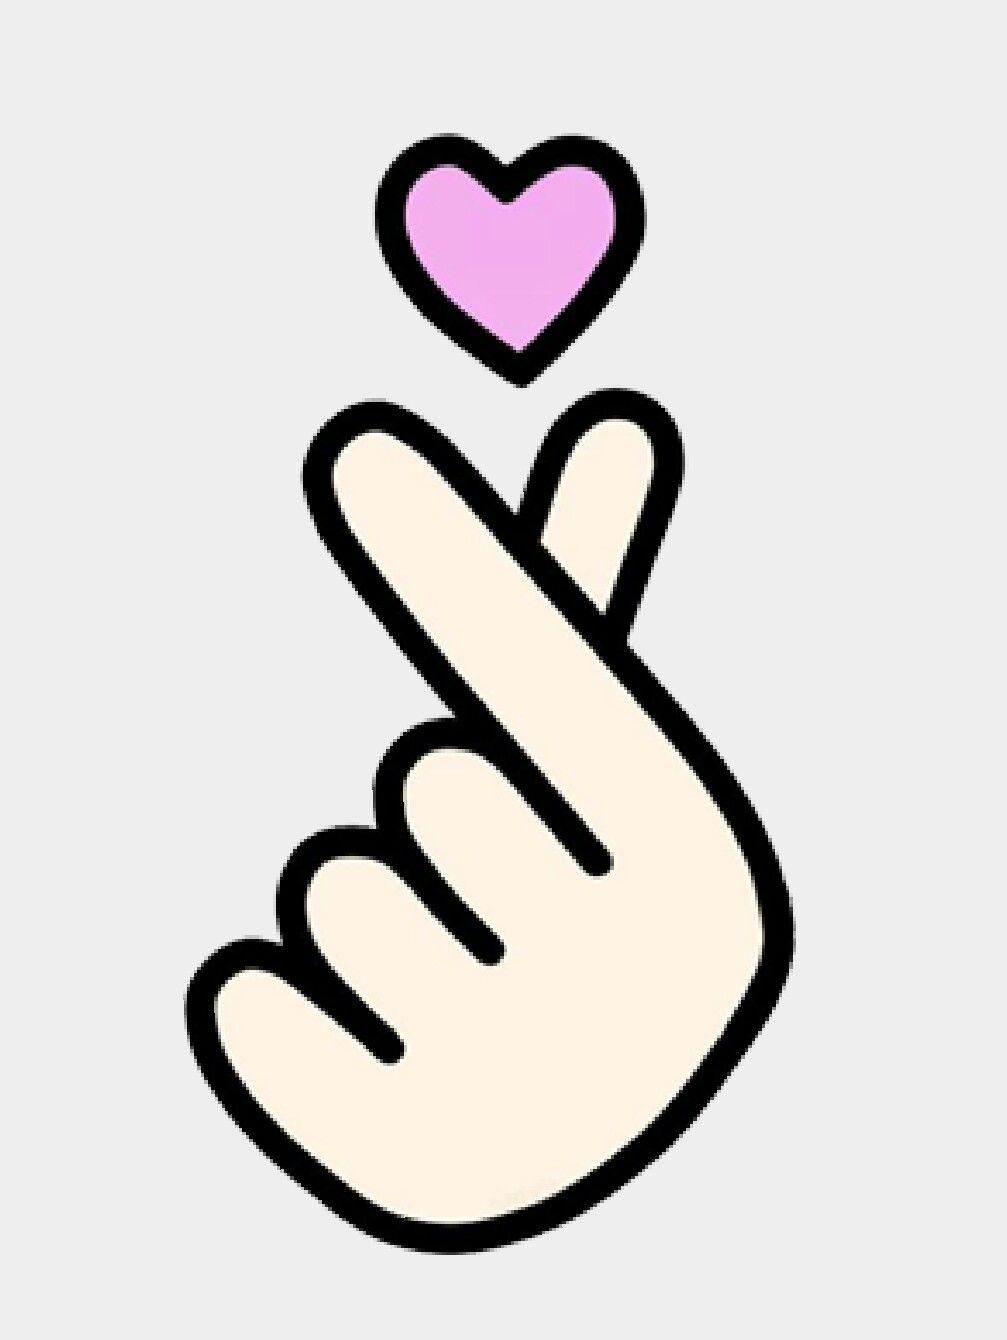 Kore Kalp Cikartma Komik Tumblr Korece